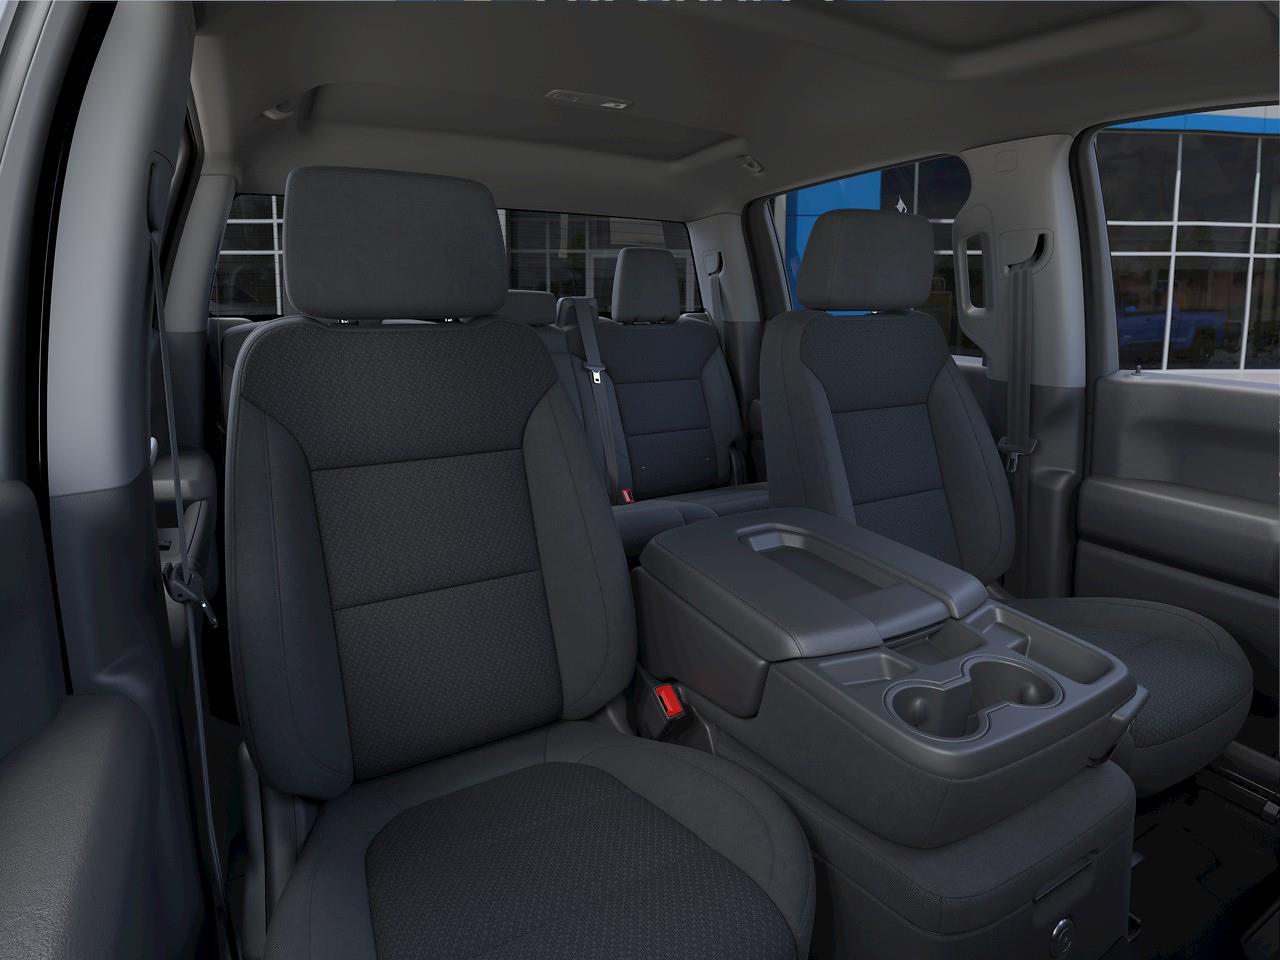 2021 Chevrolet Silverado 1500 Crew Cab 4x4, Pickup #Q210466 - photo 13